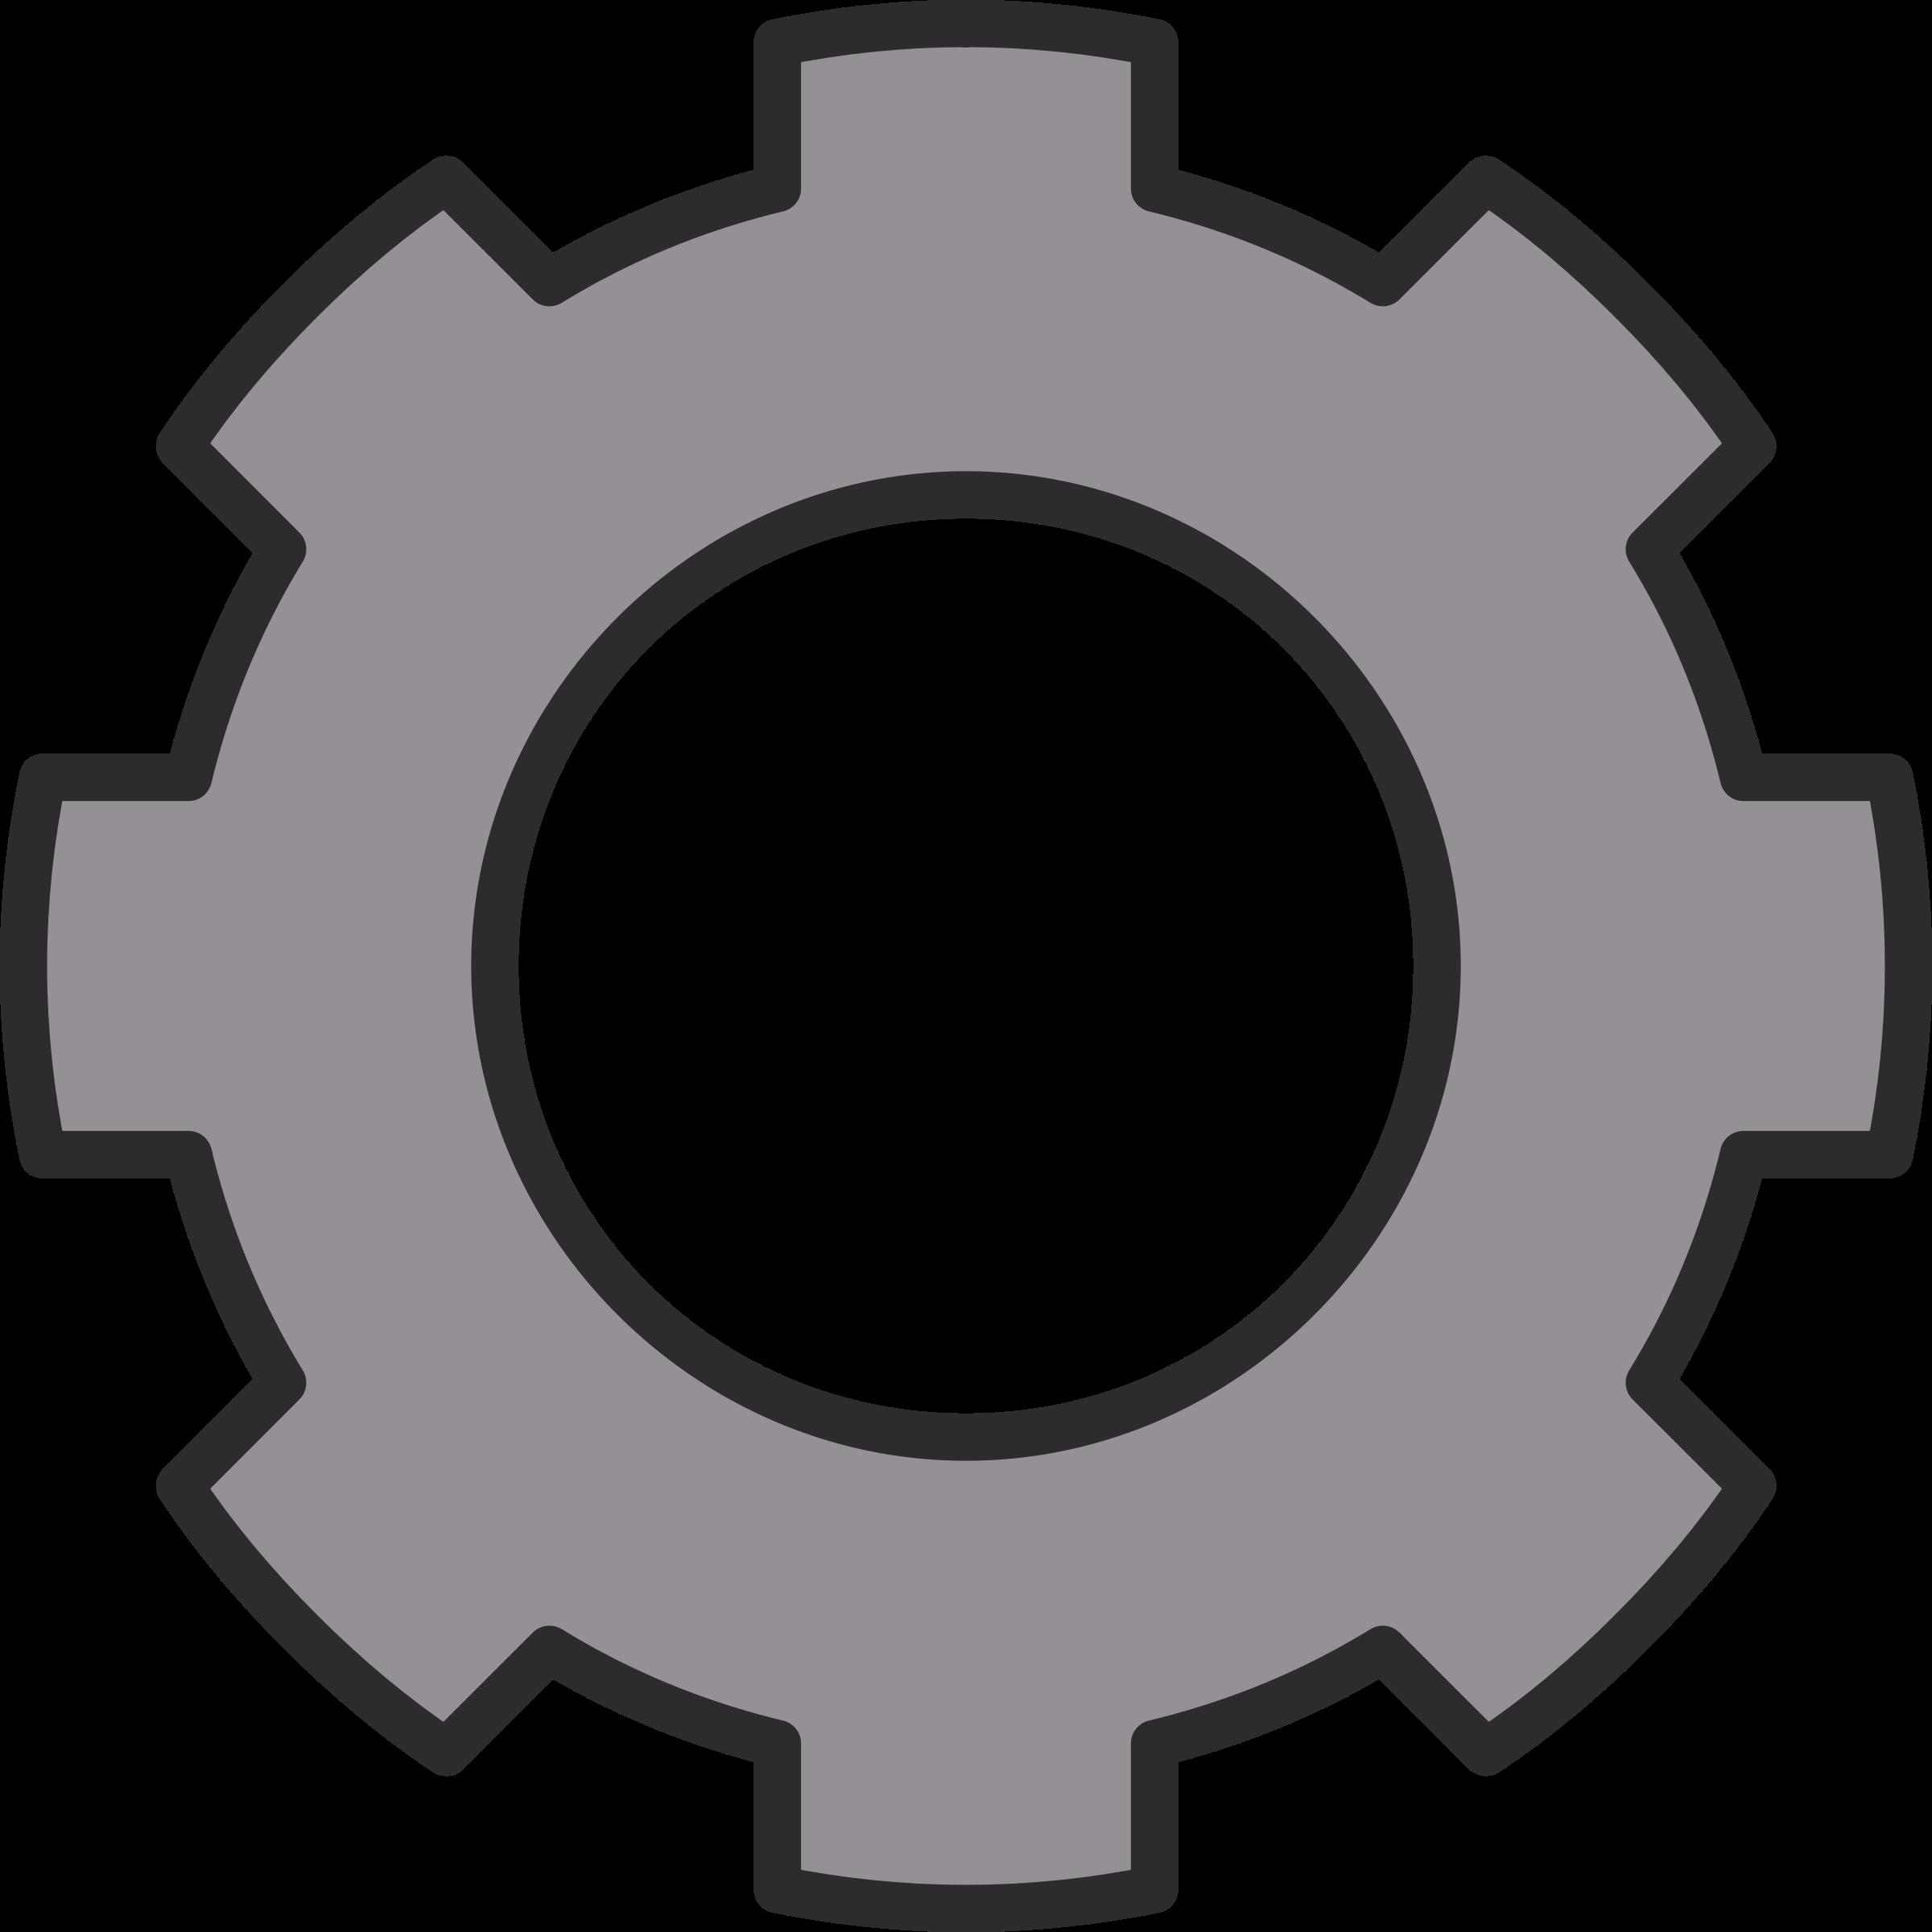 Gear Clipart Free Clip art of Gear Clipart #6452 — Clipartwork.